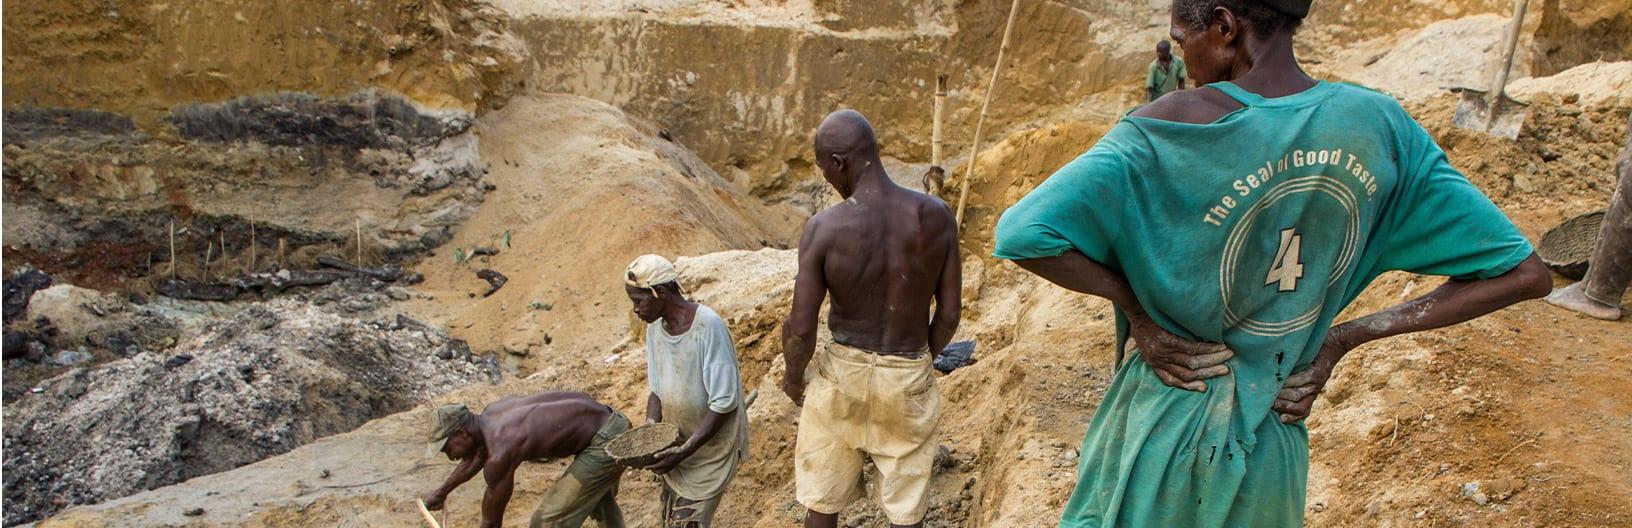 Alluvial mining in Africa